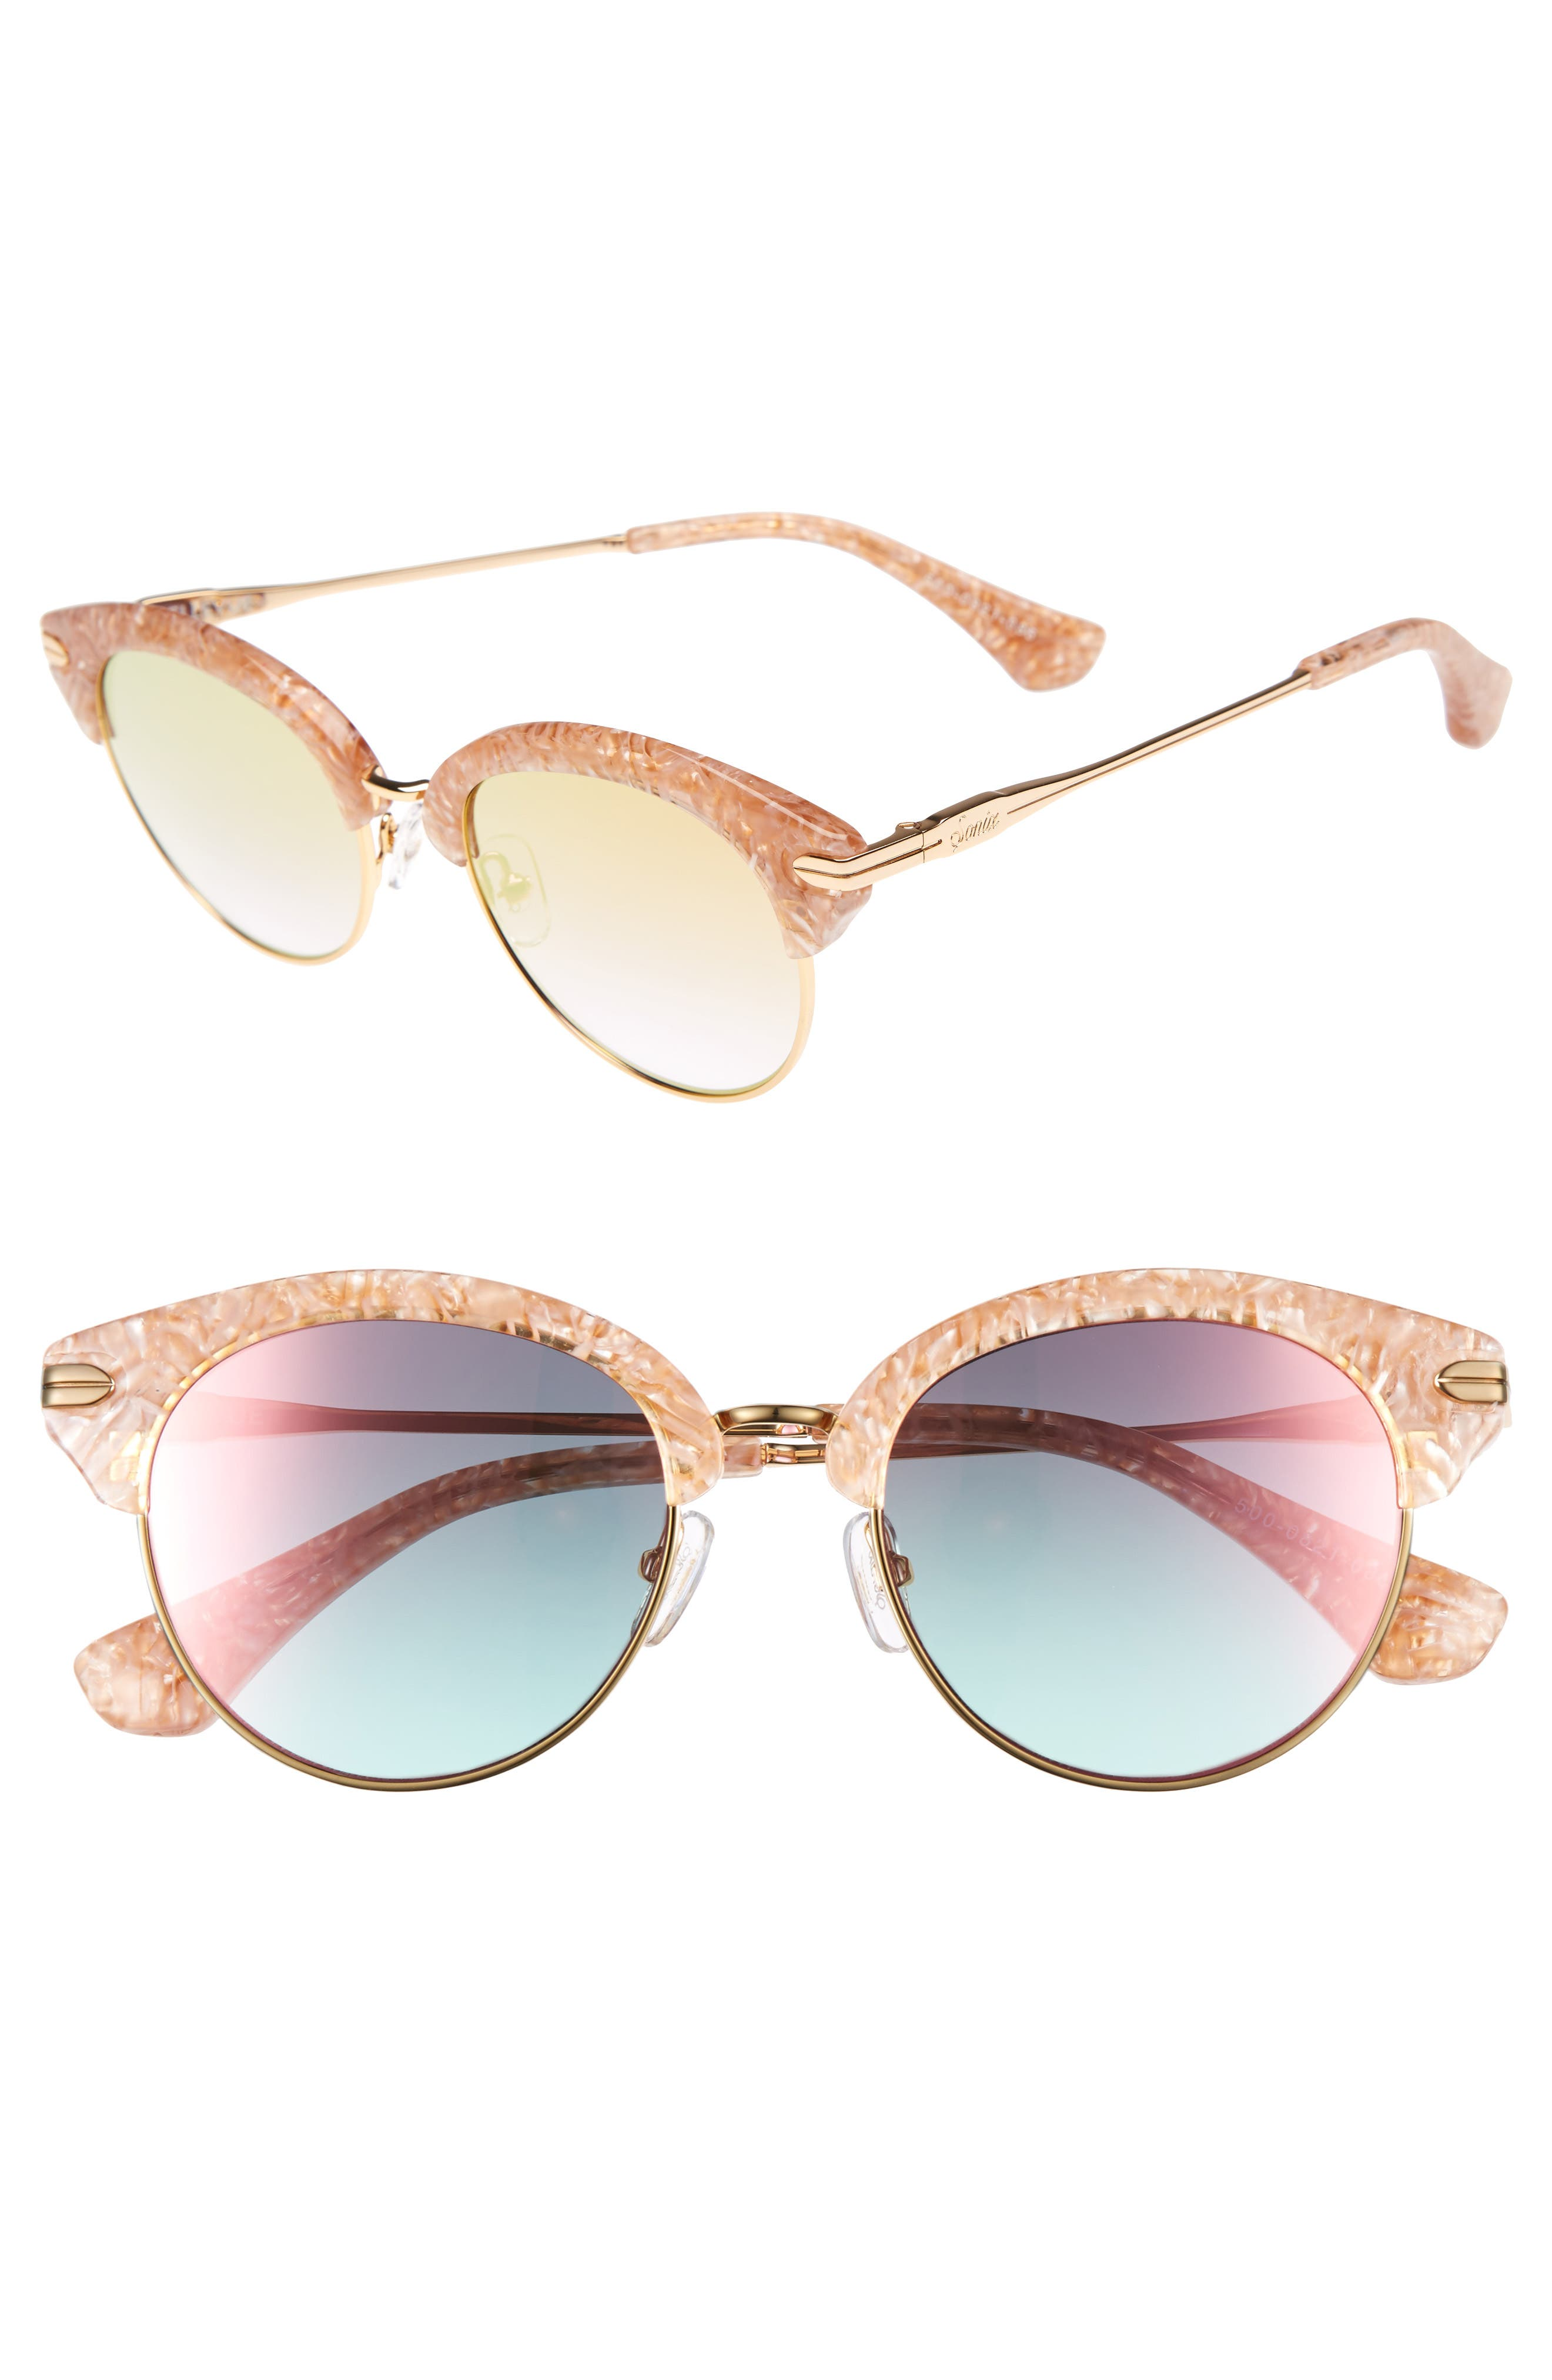 Main Image - Sonix Bellevue 50mm Mirrored Sunglasses